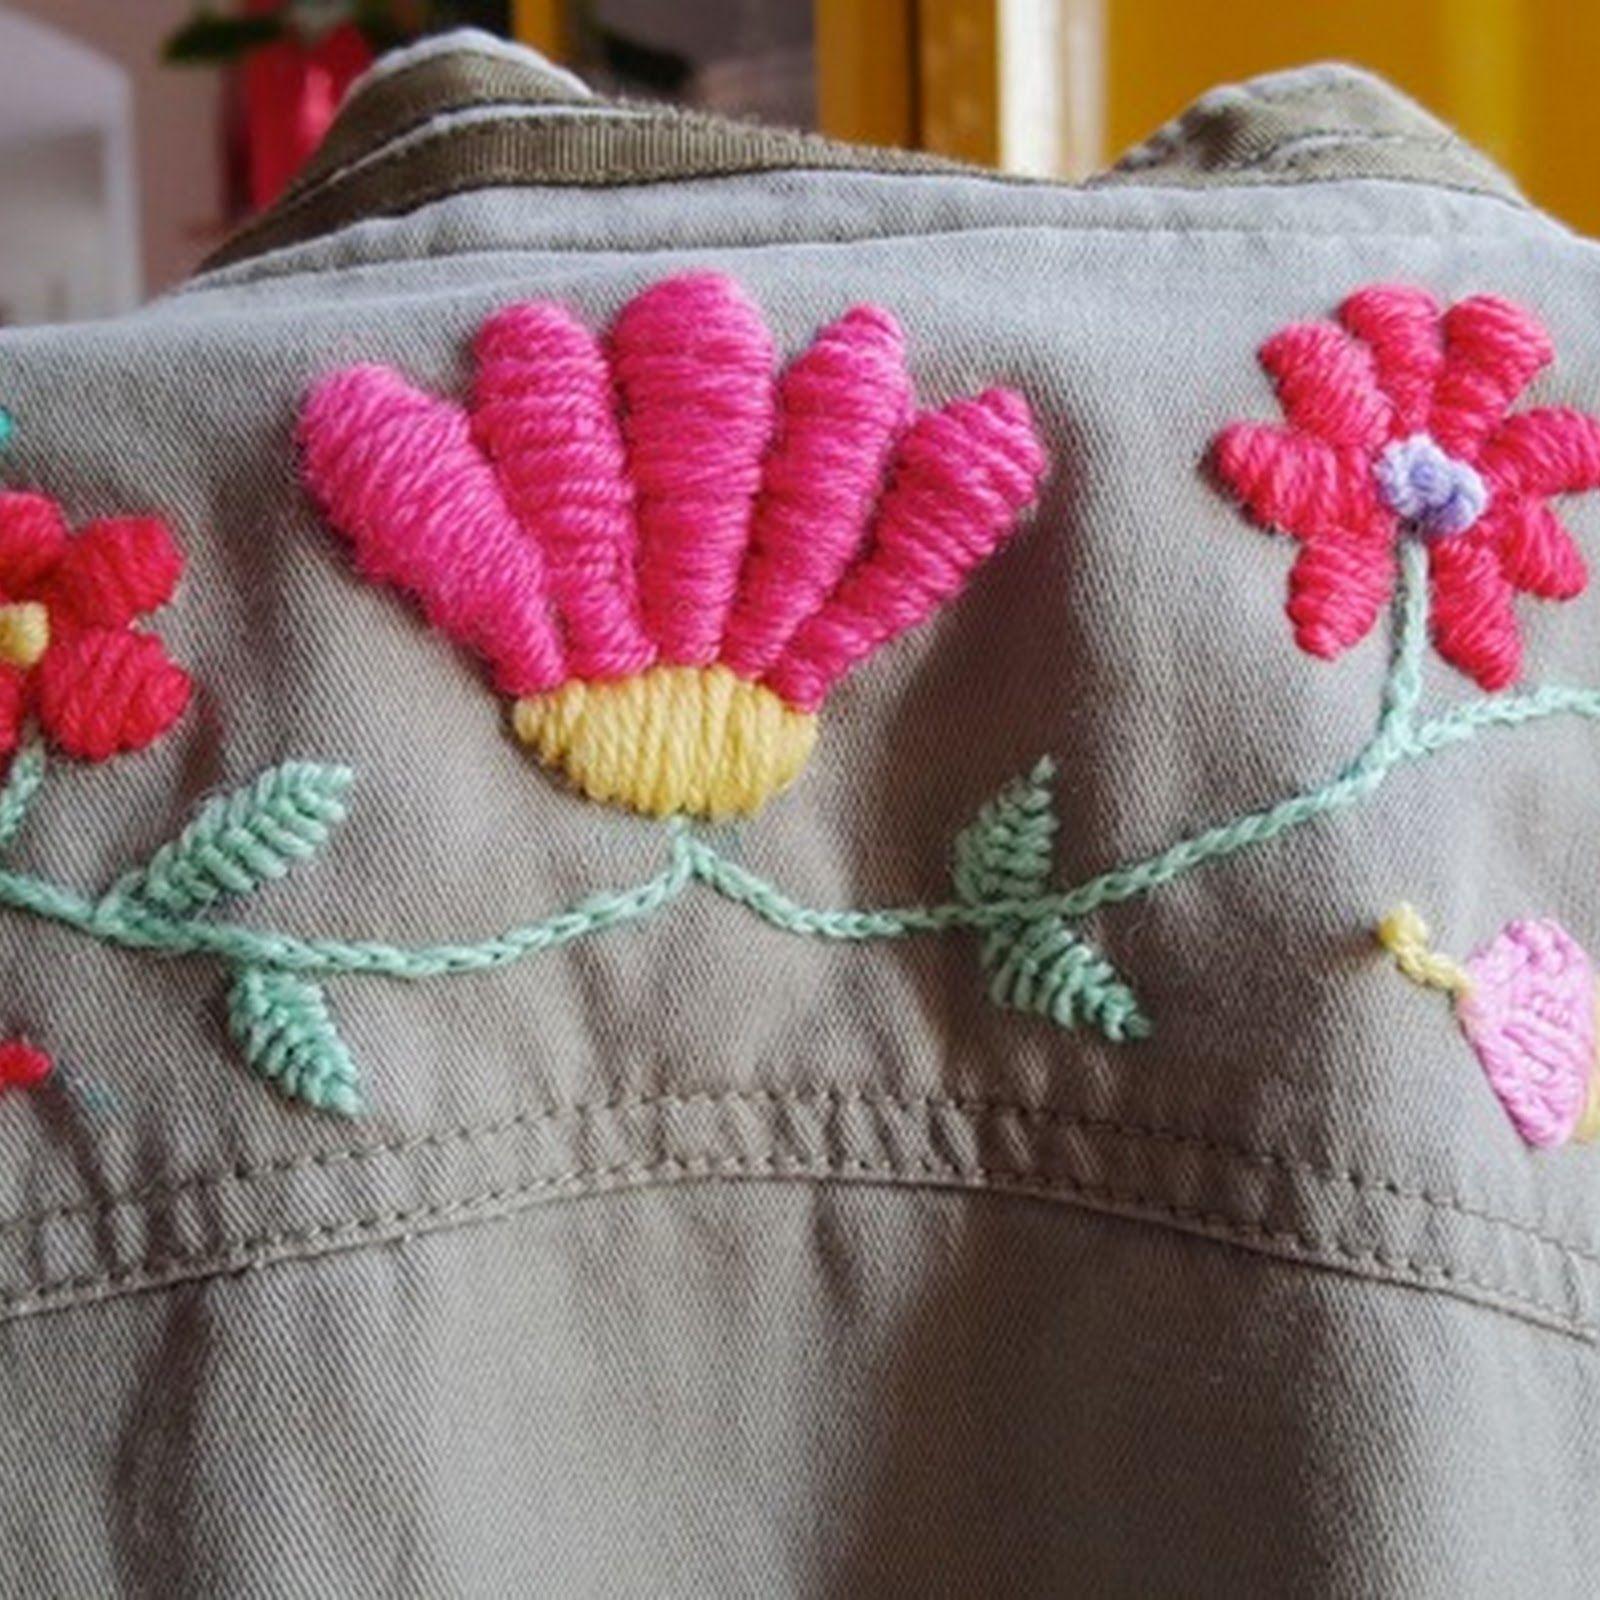 Bordado mexicano con lana en ropa